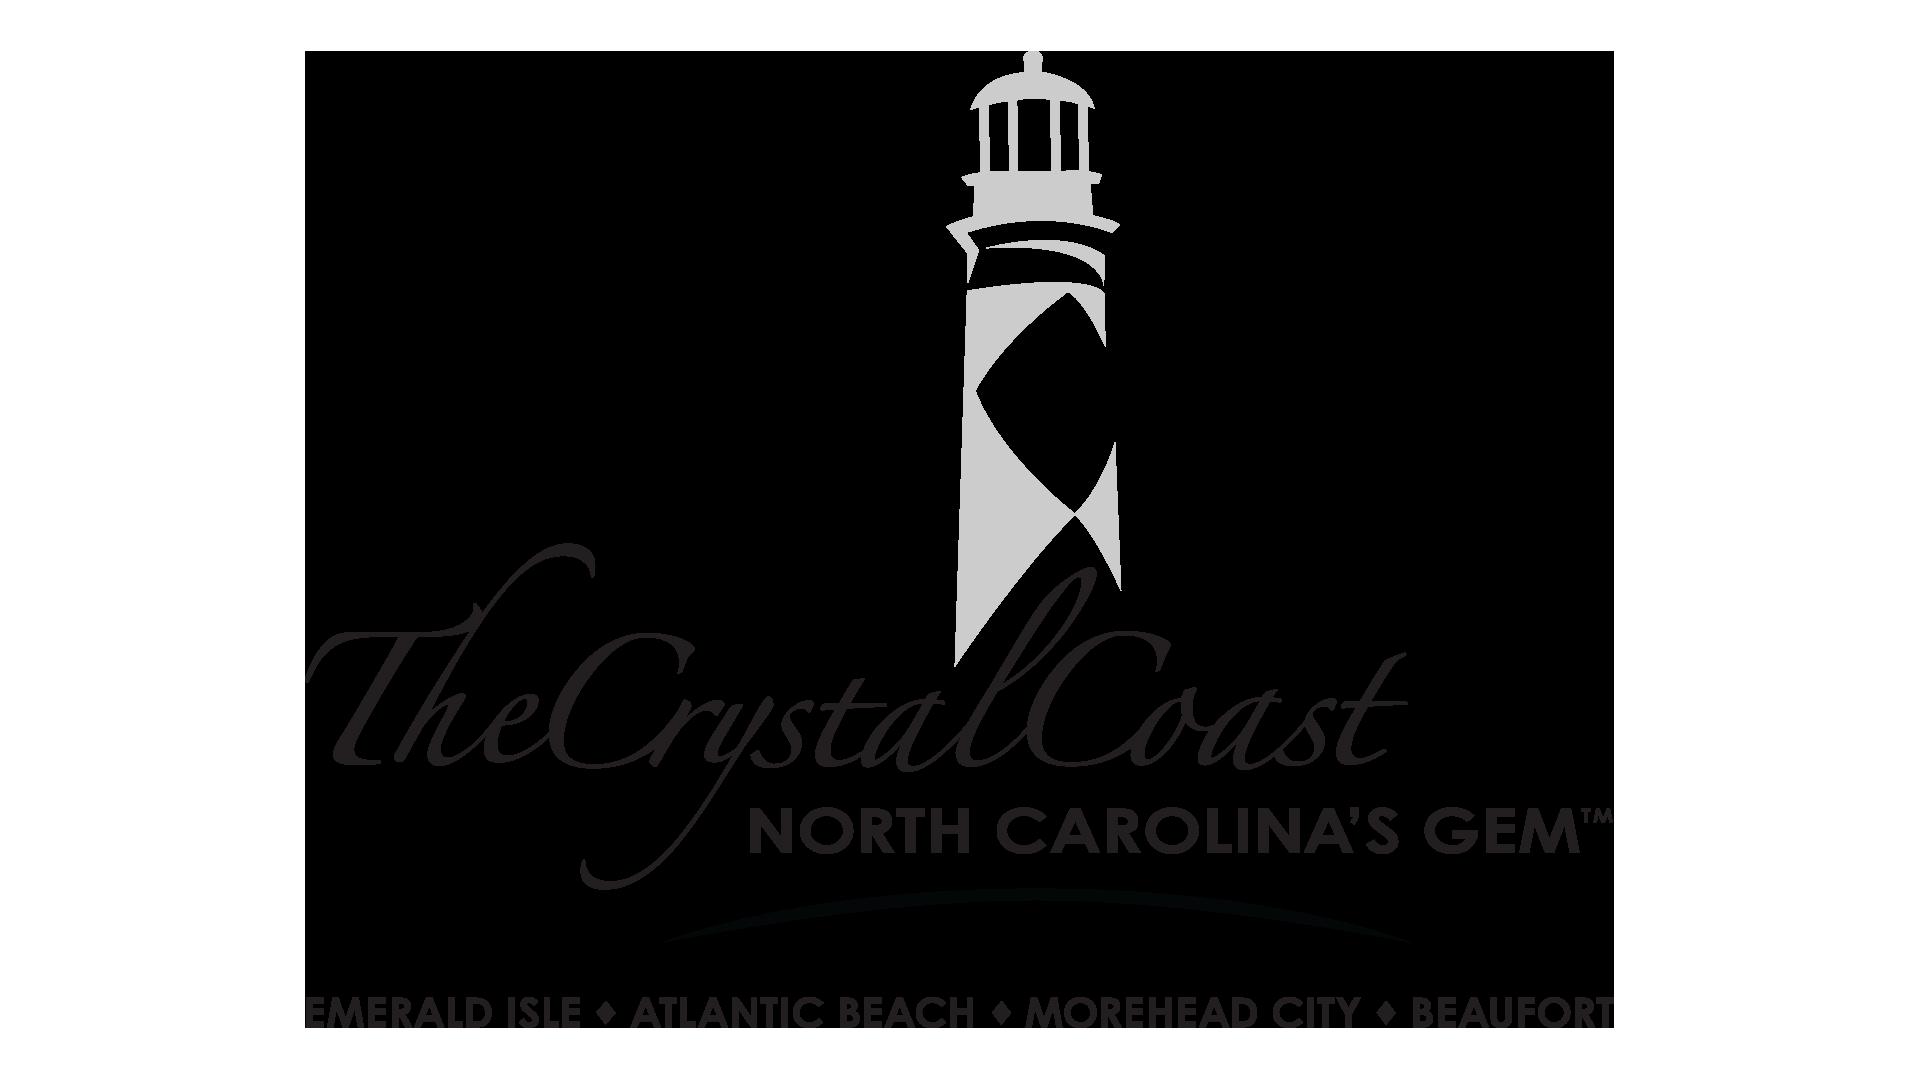 Sponsor Crystal Coast Tourism Development